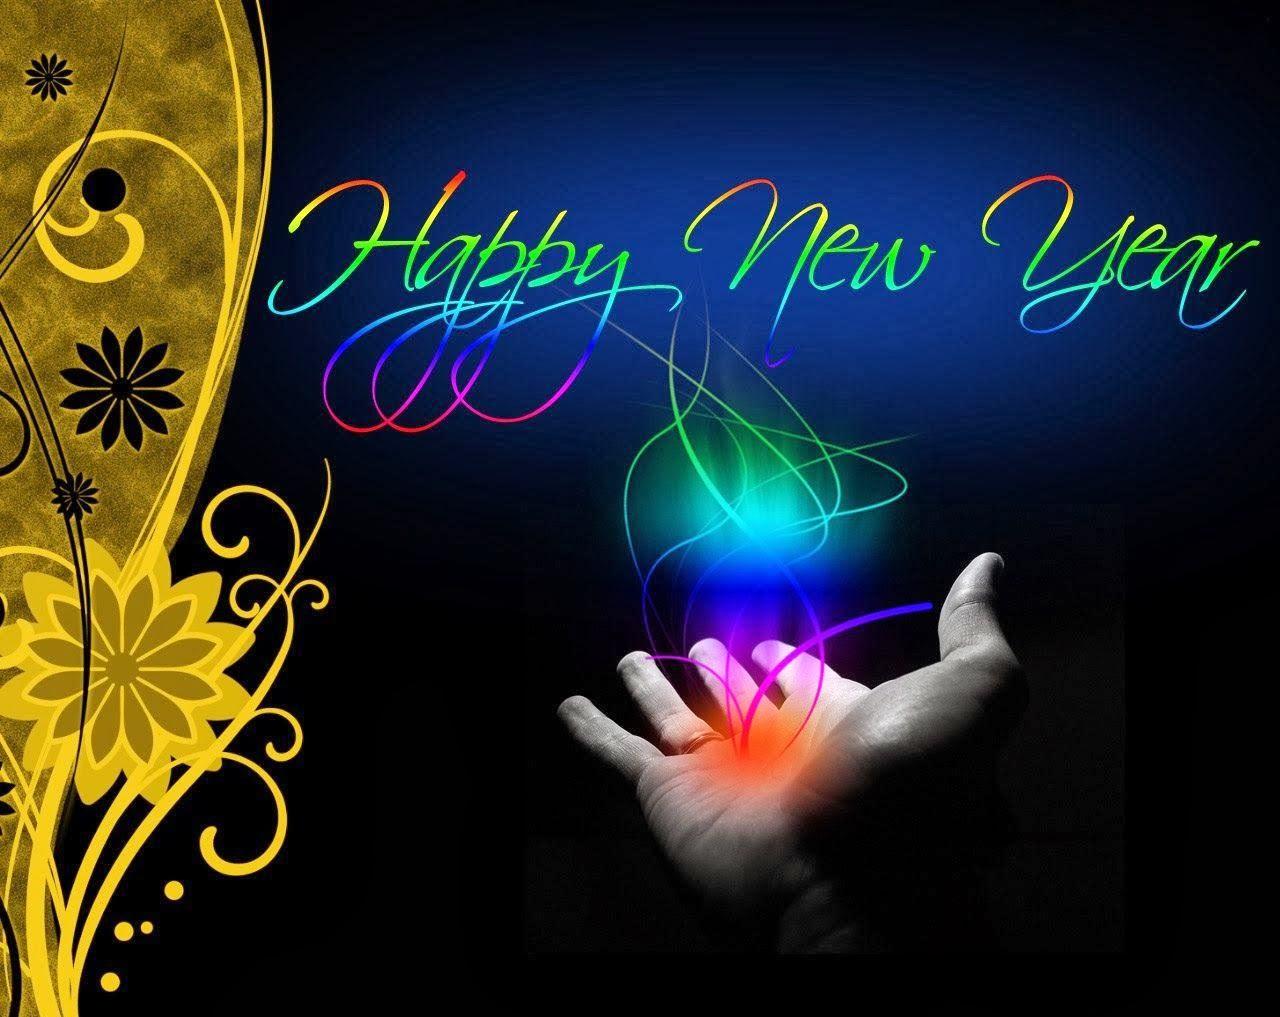 Most Beautiful Happy New Year 2014 Wallpapers ~ Free HD Desktop ...